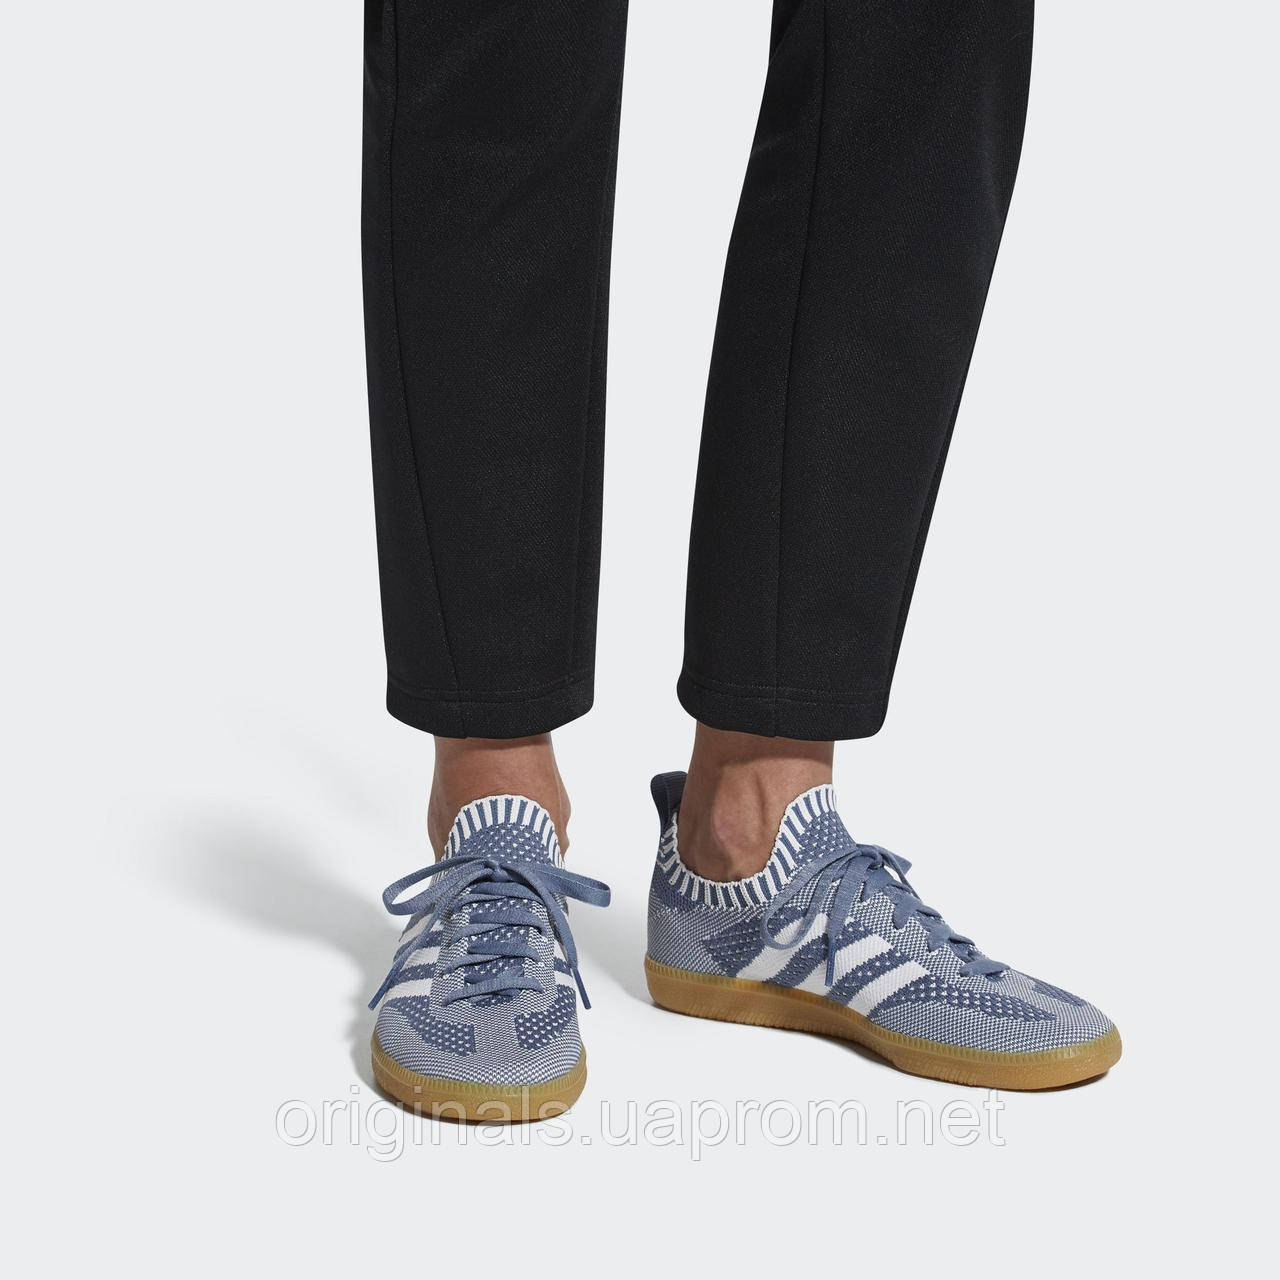 Adidas Samba кроссовки женские CQ2686